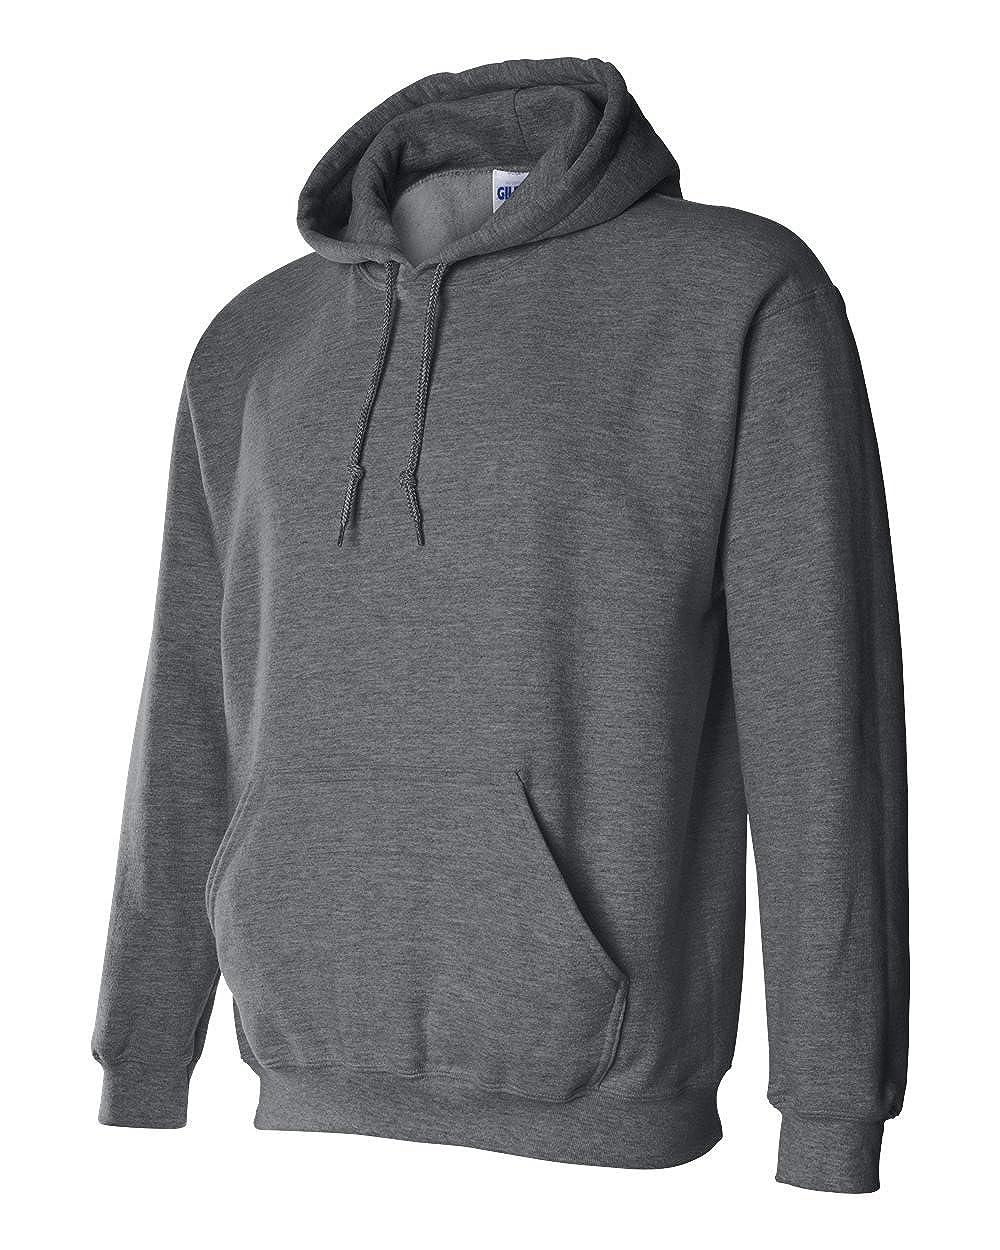 47a4c97c999719 Plain Dark Grey Cotten Woolen Men s Sweatshirts  Amazon.in  Clothing    Accessories